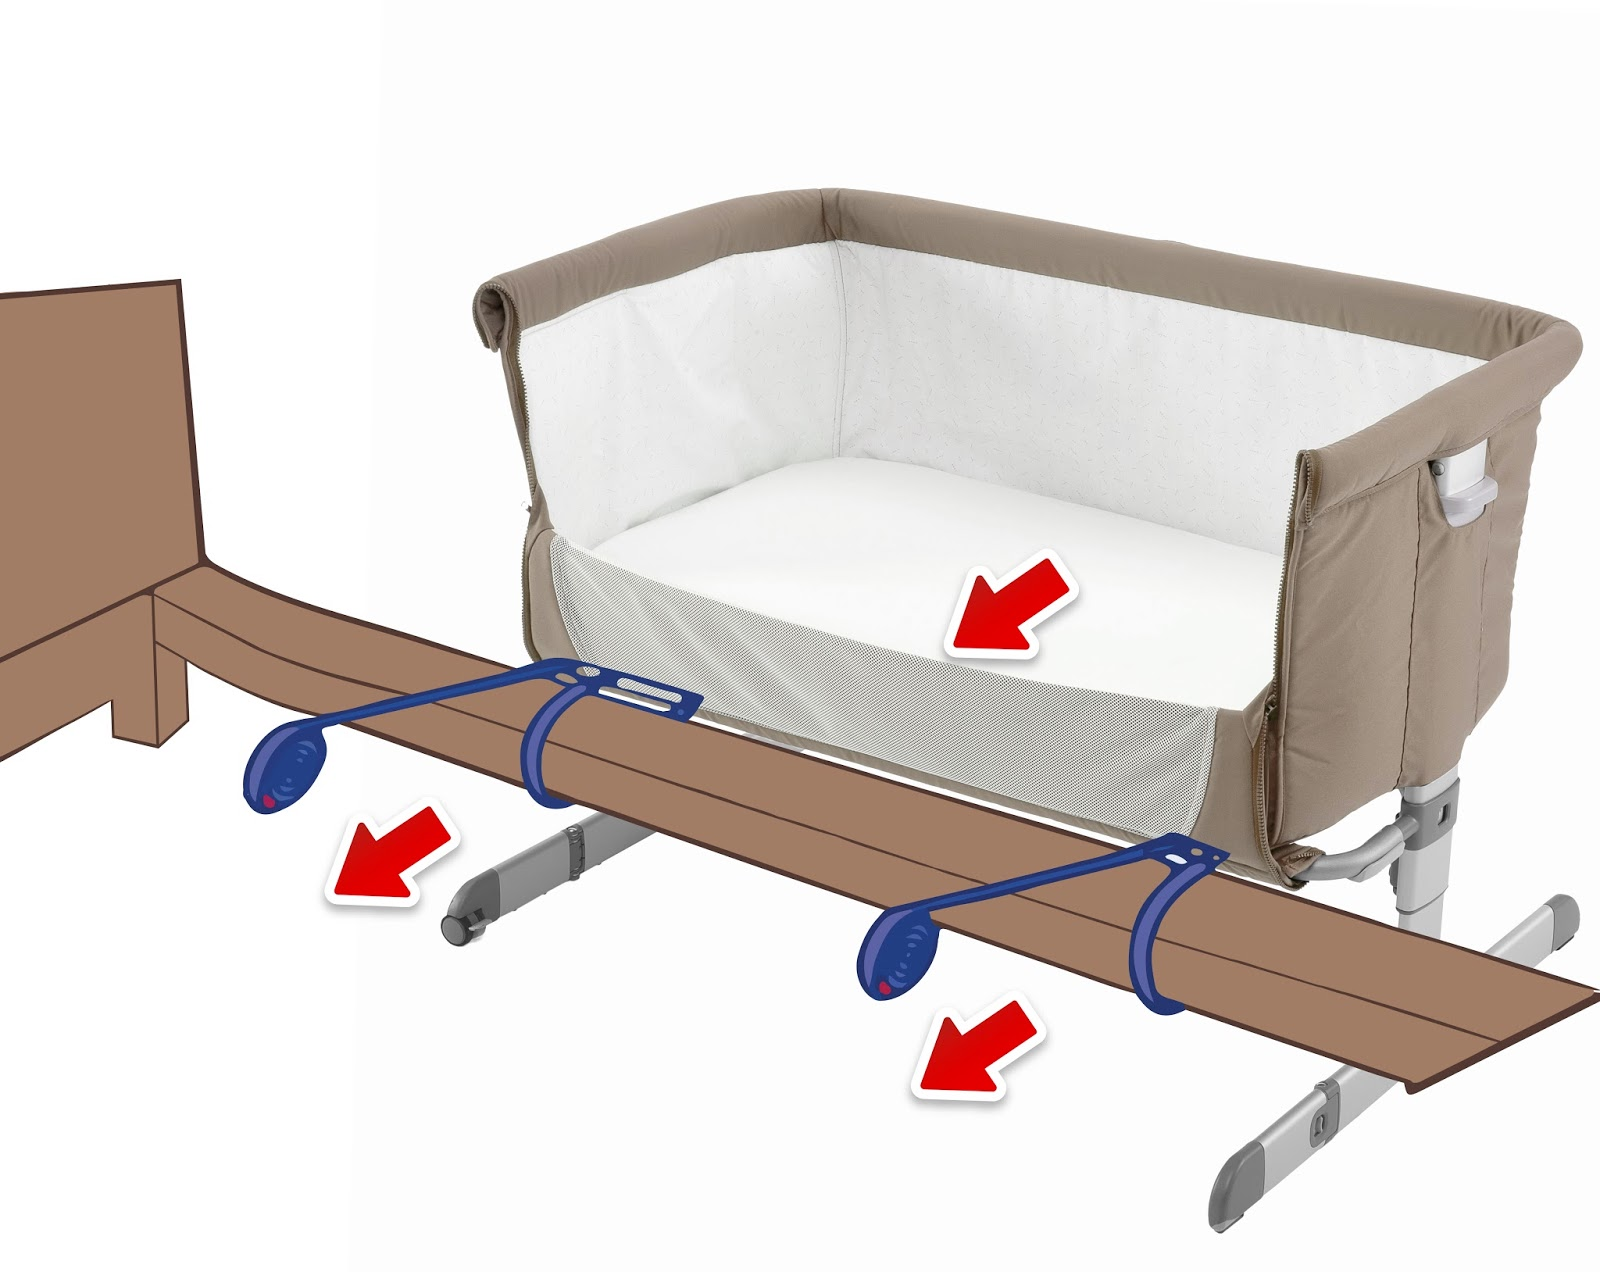 le cododo dormir avec b b sans risques blog toys 39 r 39 us. Black Bedroom Furniture Sets. Home Design Ideas